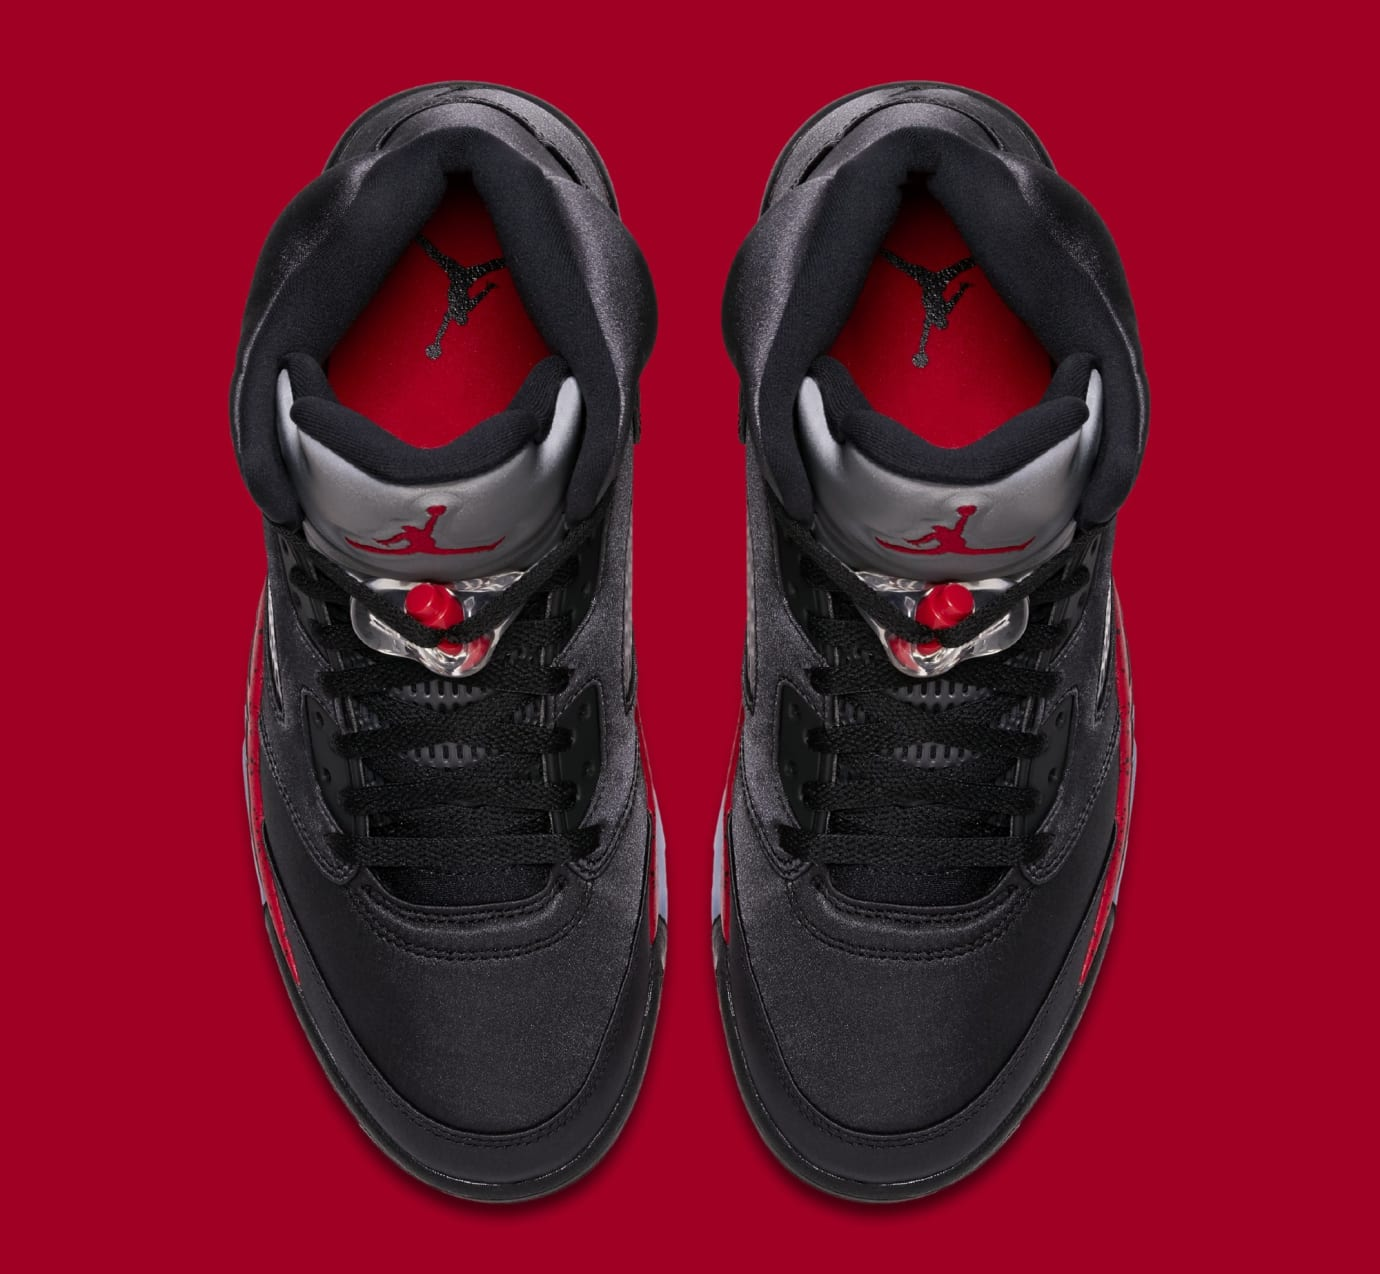 2b262b73eab7e1 Image via Nike Air Jordan 5 Retro  Black University Red  136027-006 (Top)